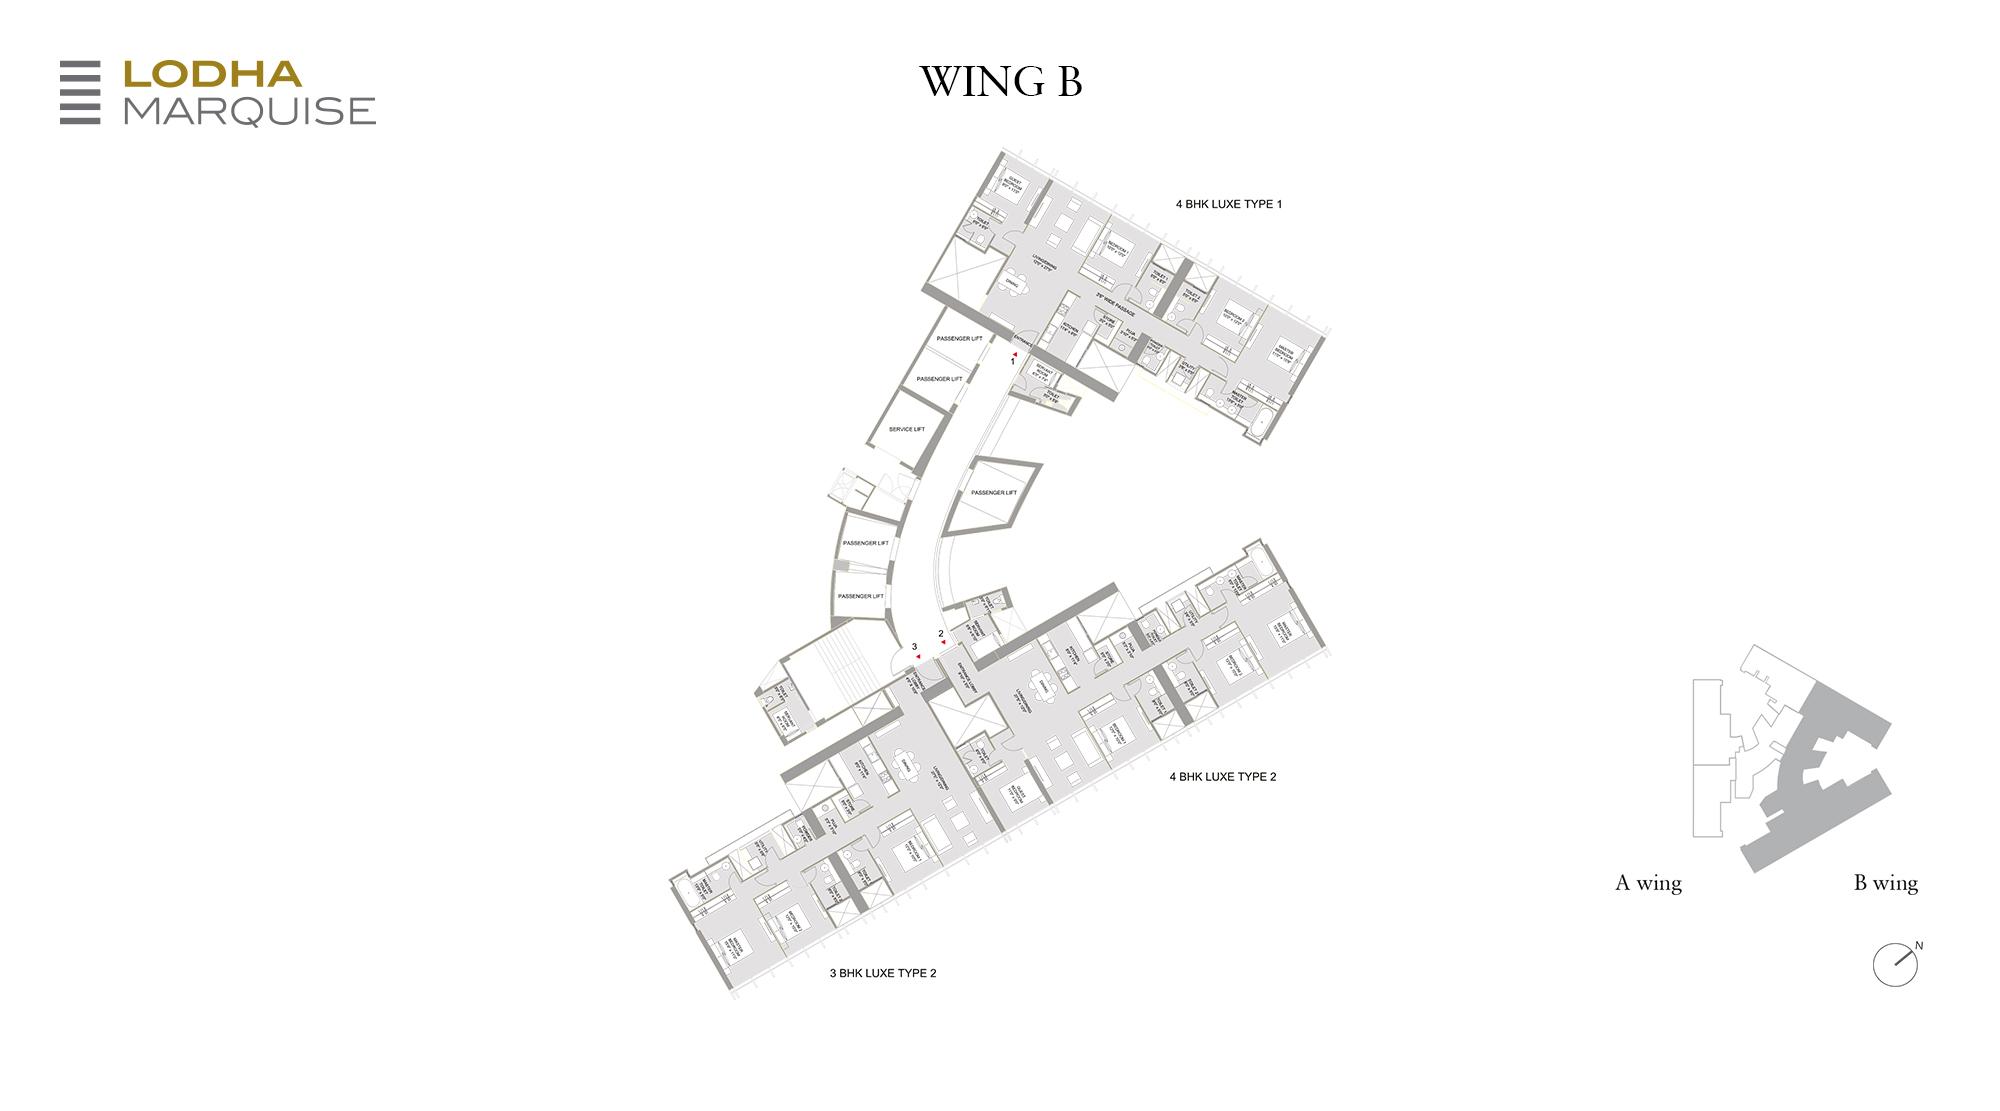 Marquise - B Wing Floor Plan